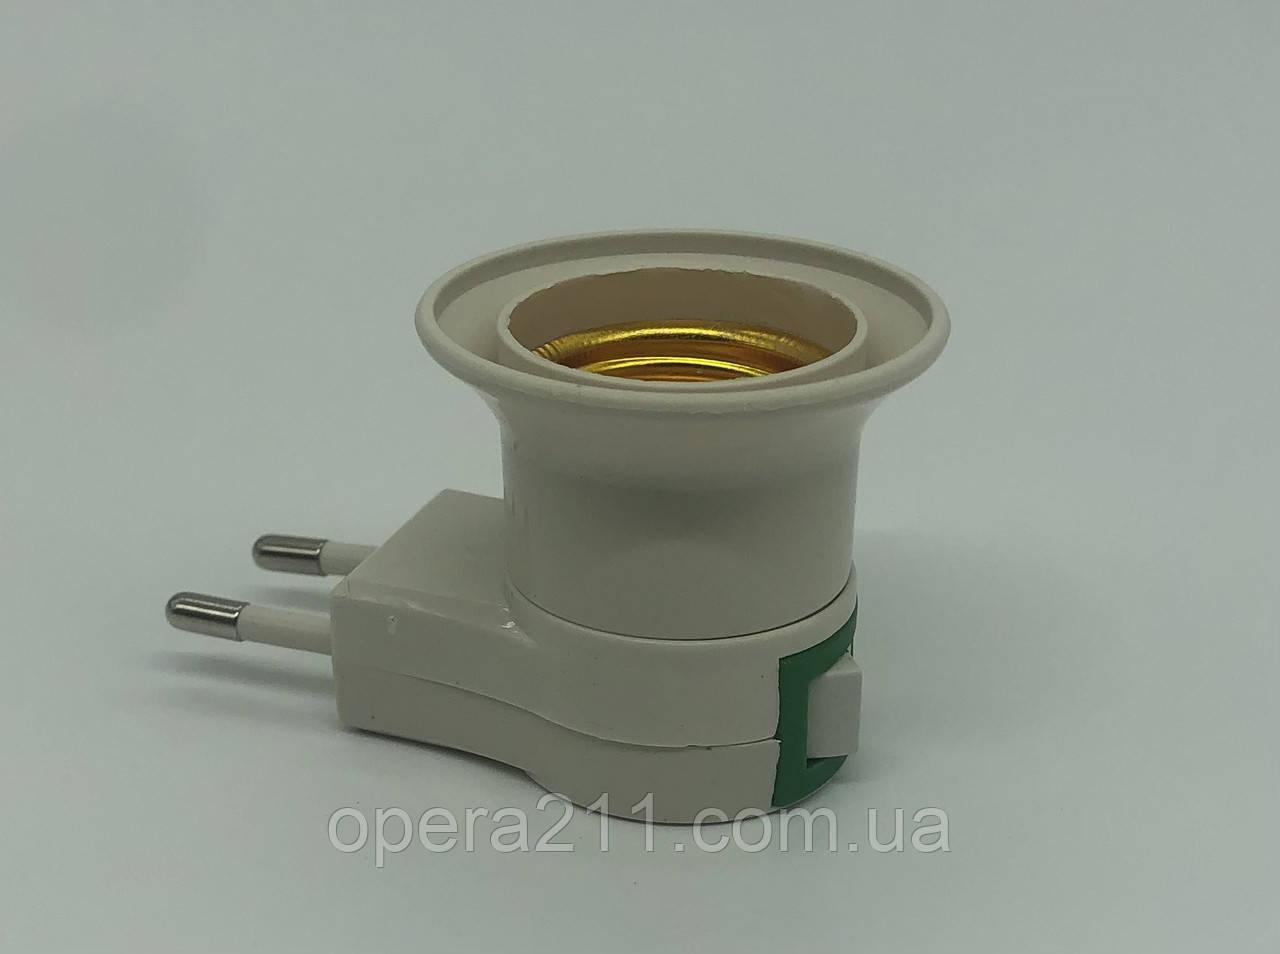 Патрон-Адаптер PLUG FOR LIGHT BULB / ART-0319 (1000шт)